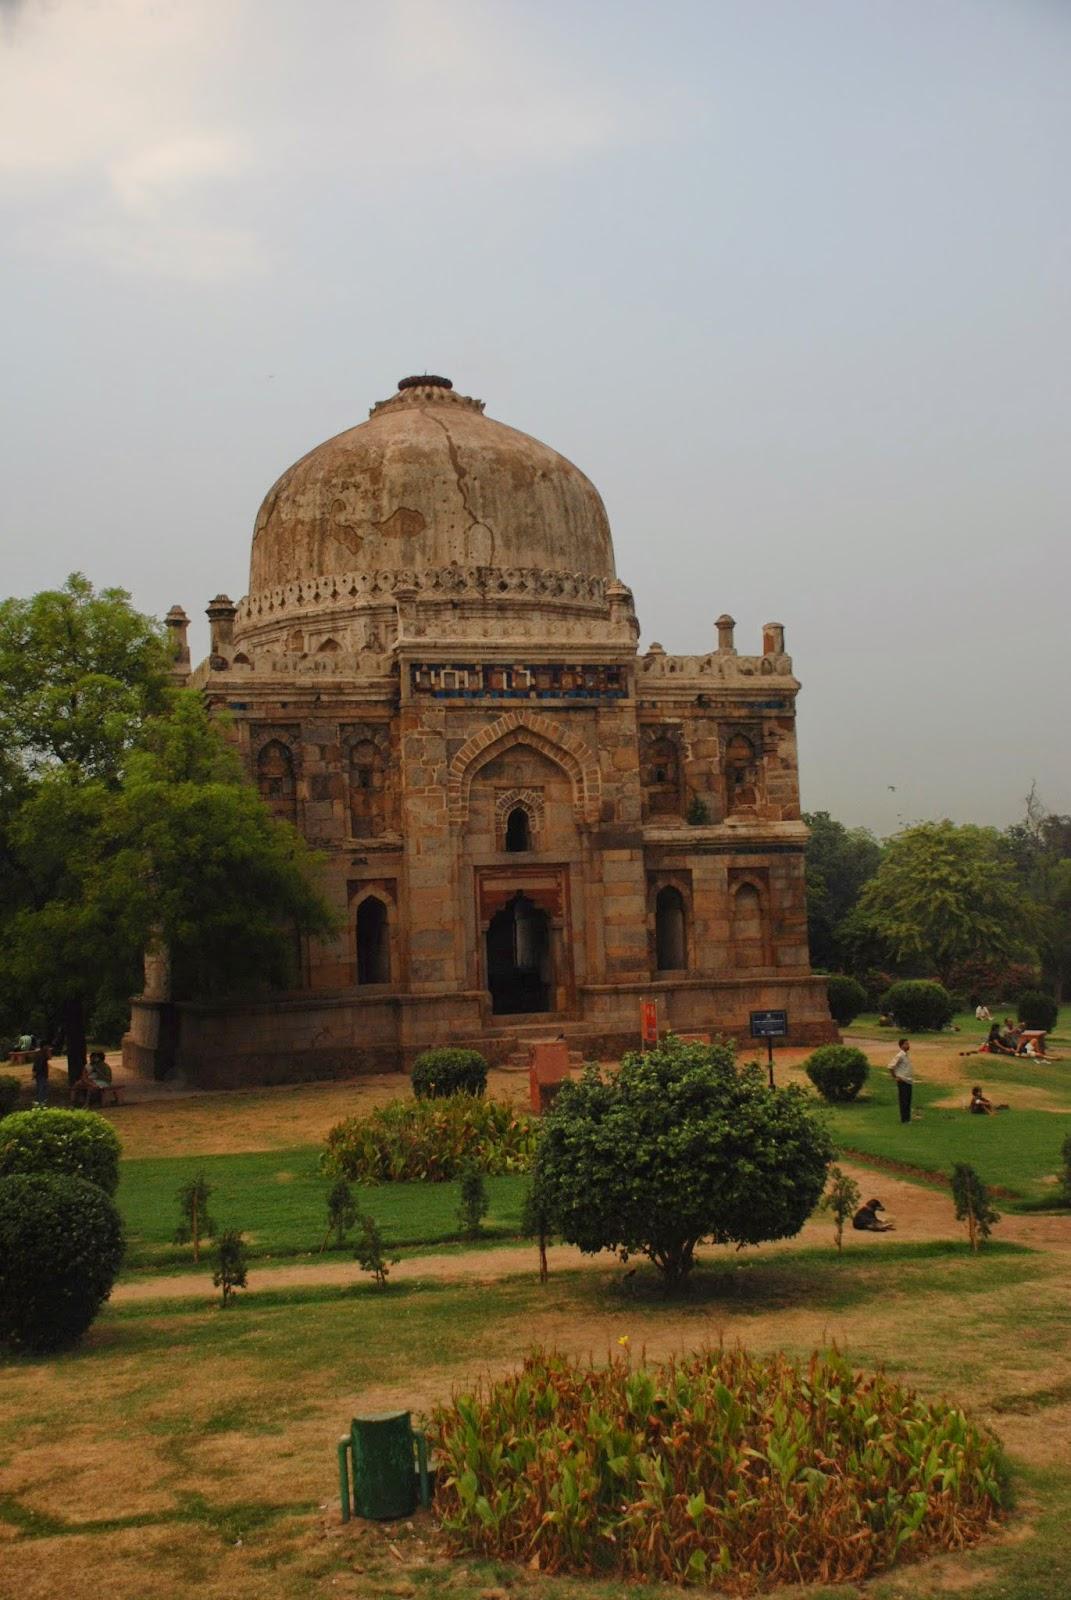 aswana-cliche: Delhi - Lodhi Garden